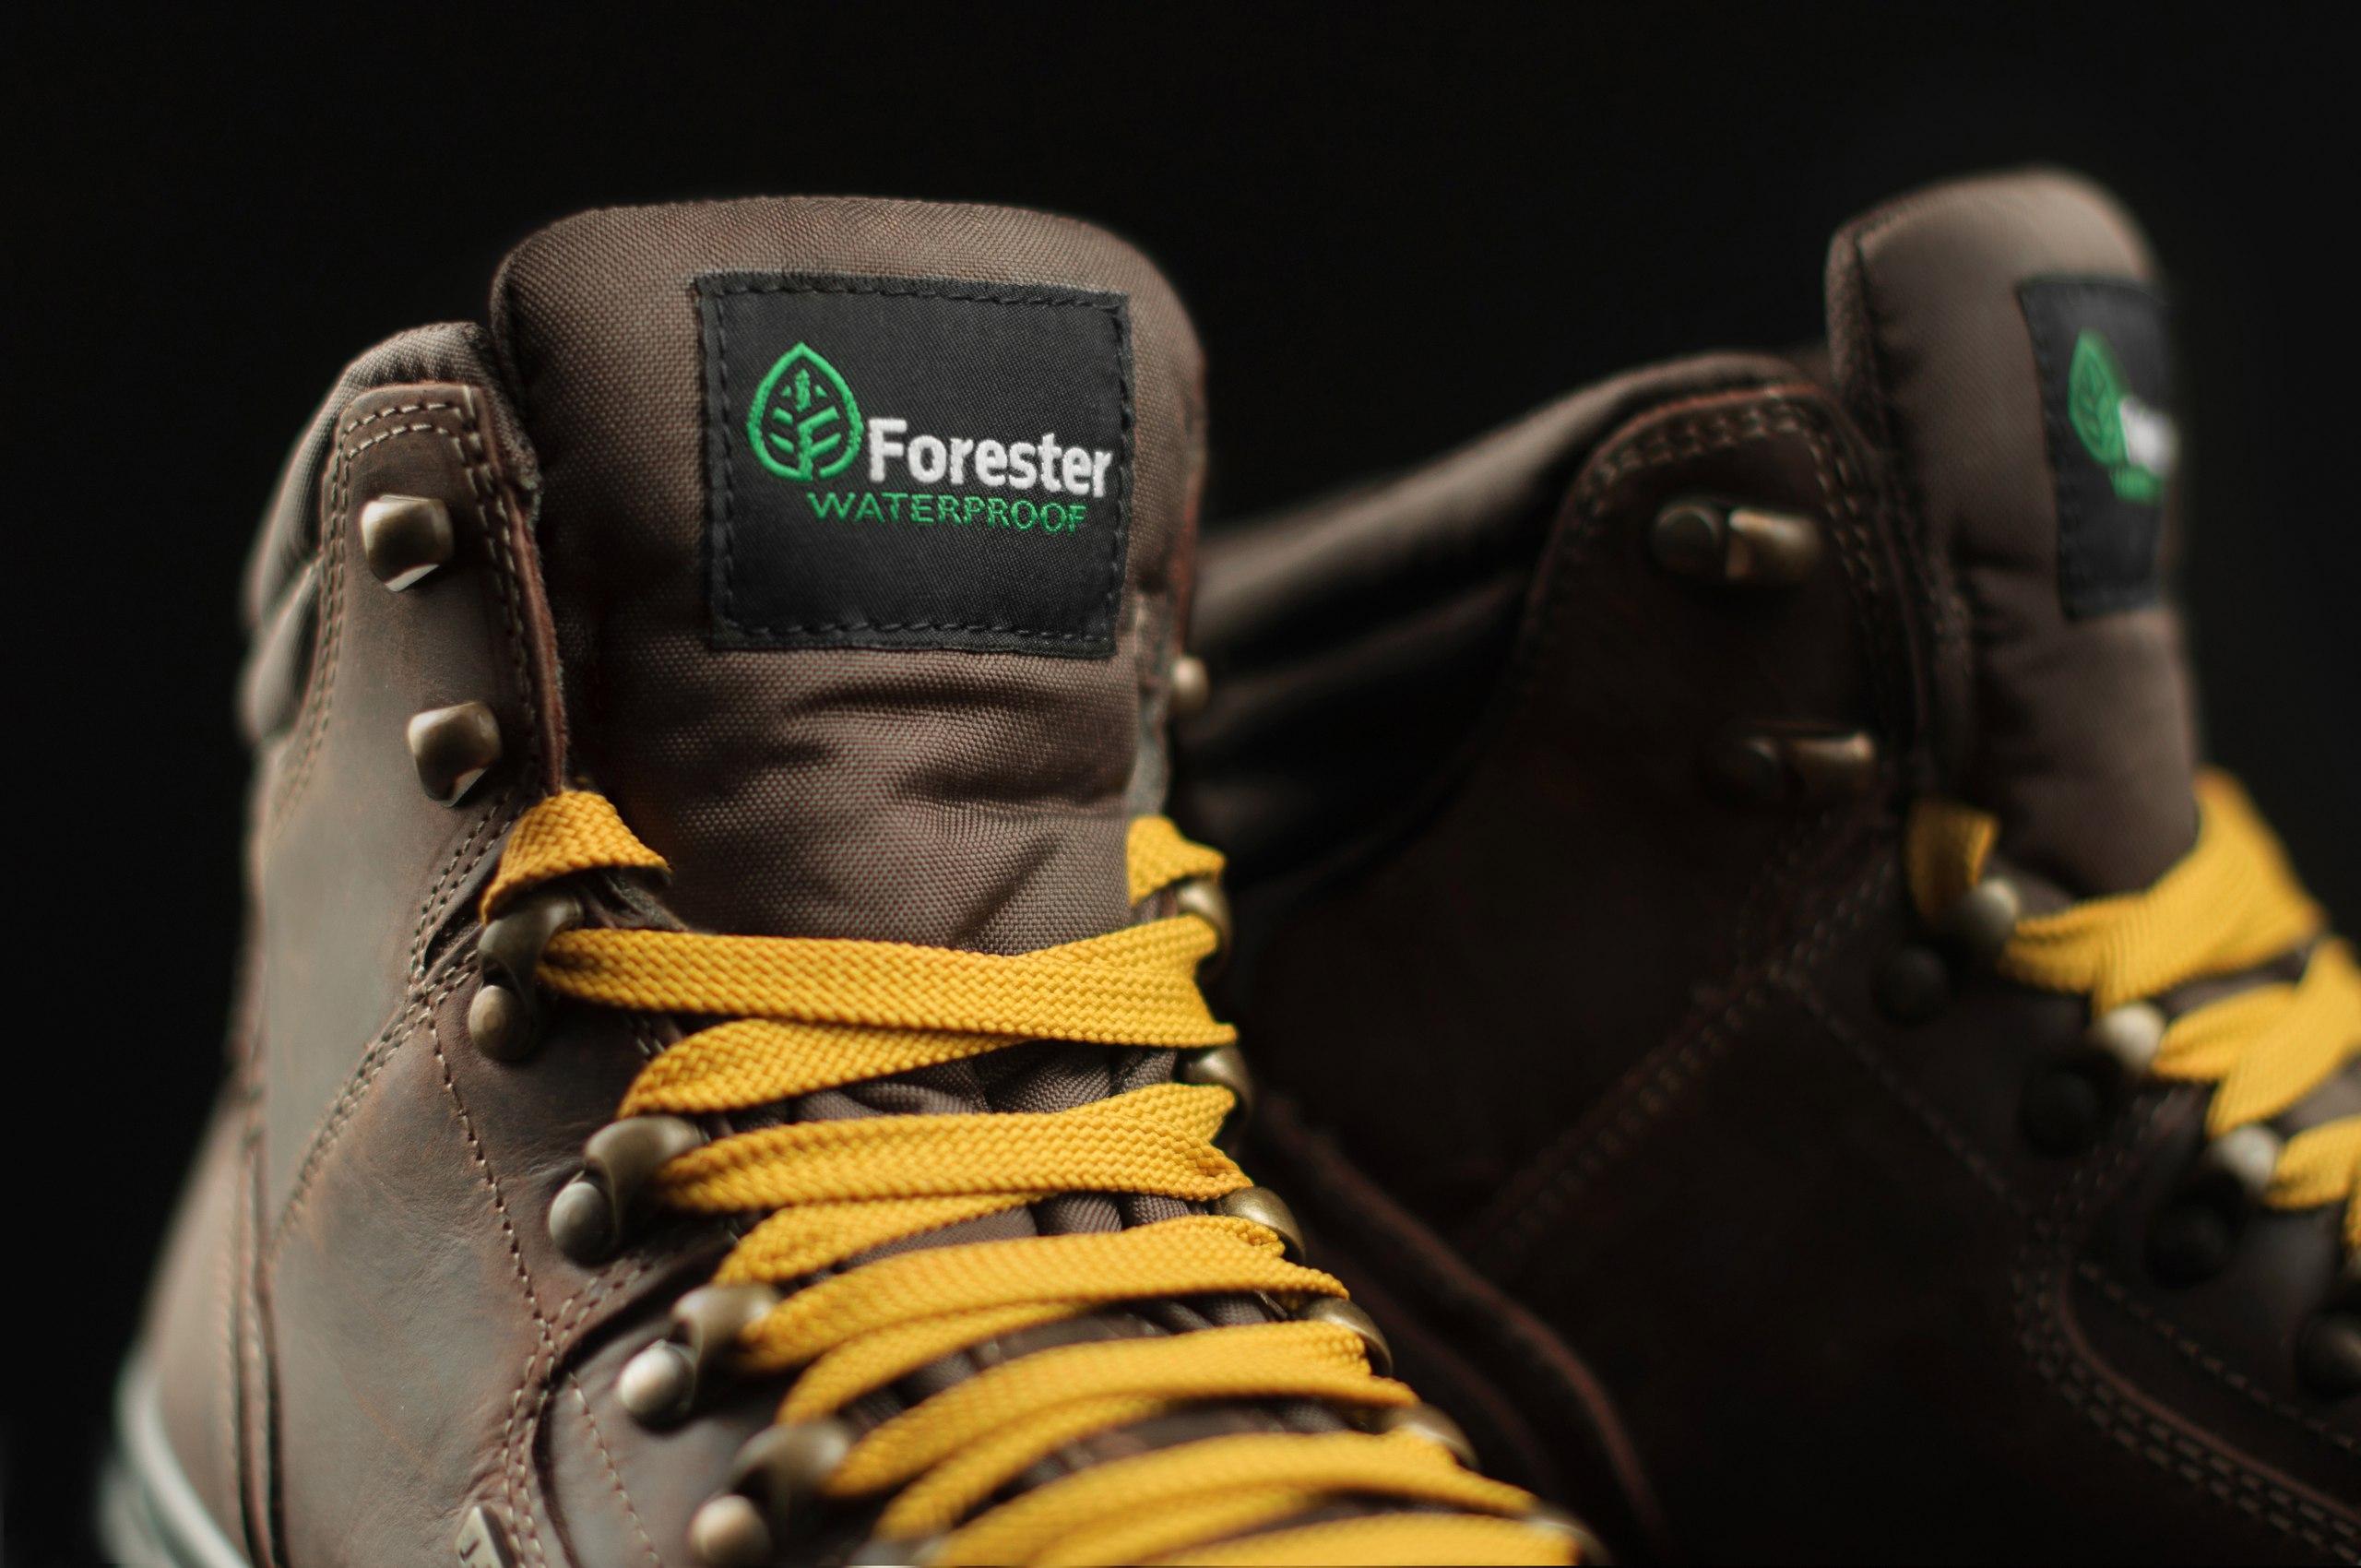 Готовимся к зиме вместе с Forester